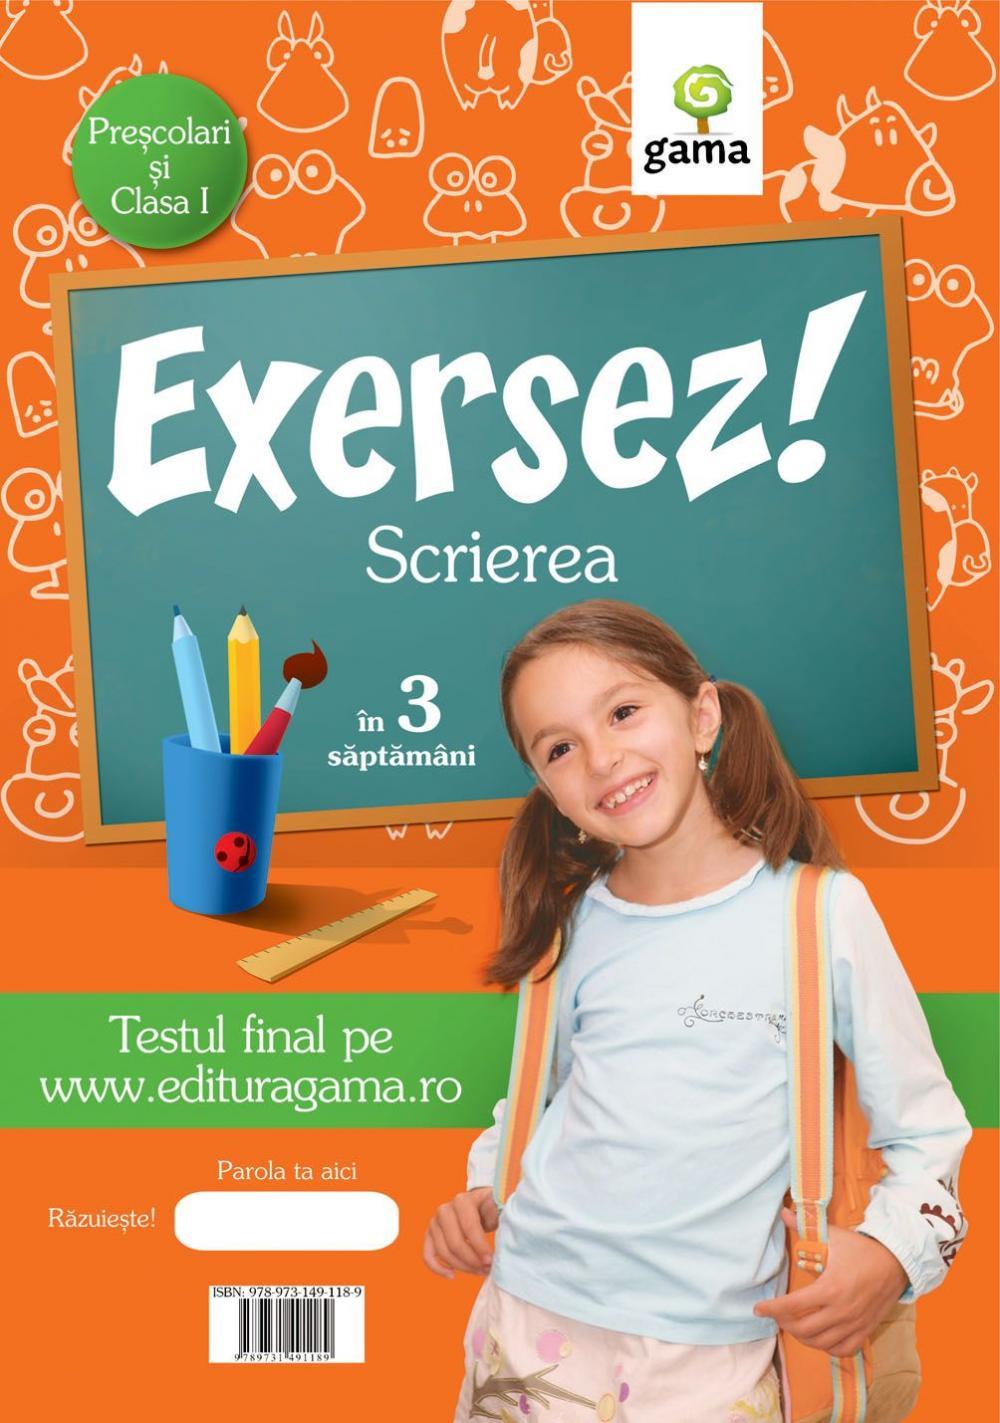 SCRIEREA/ EXERSEZ